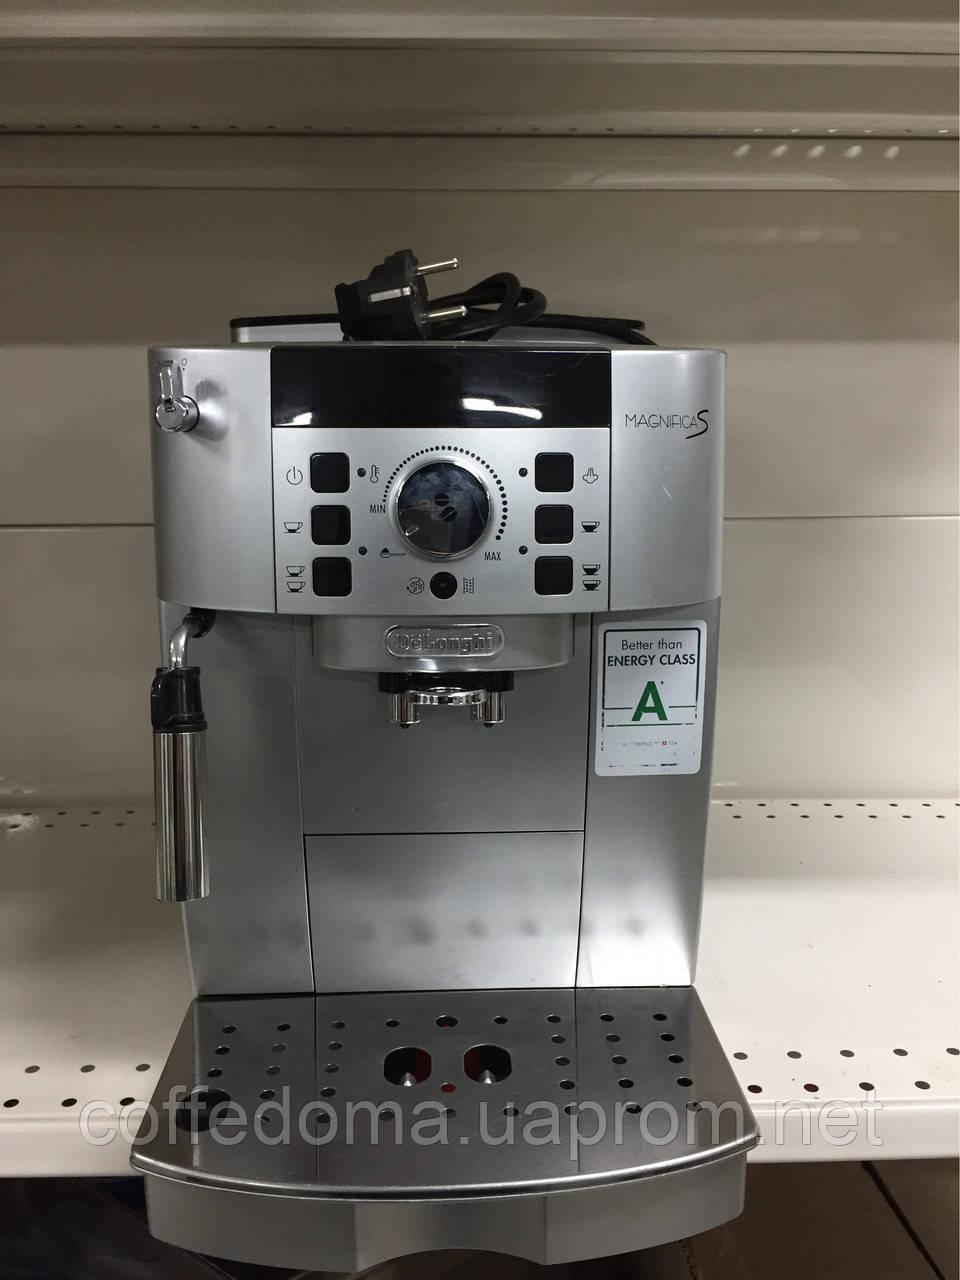 Delonghi ecam 22.110 SB автоматическая кофемашина